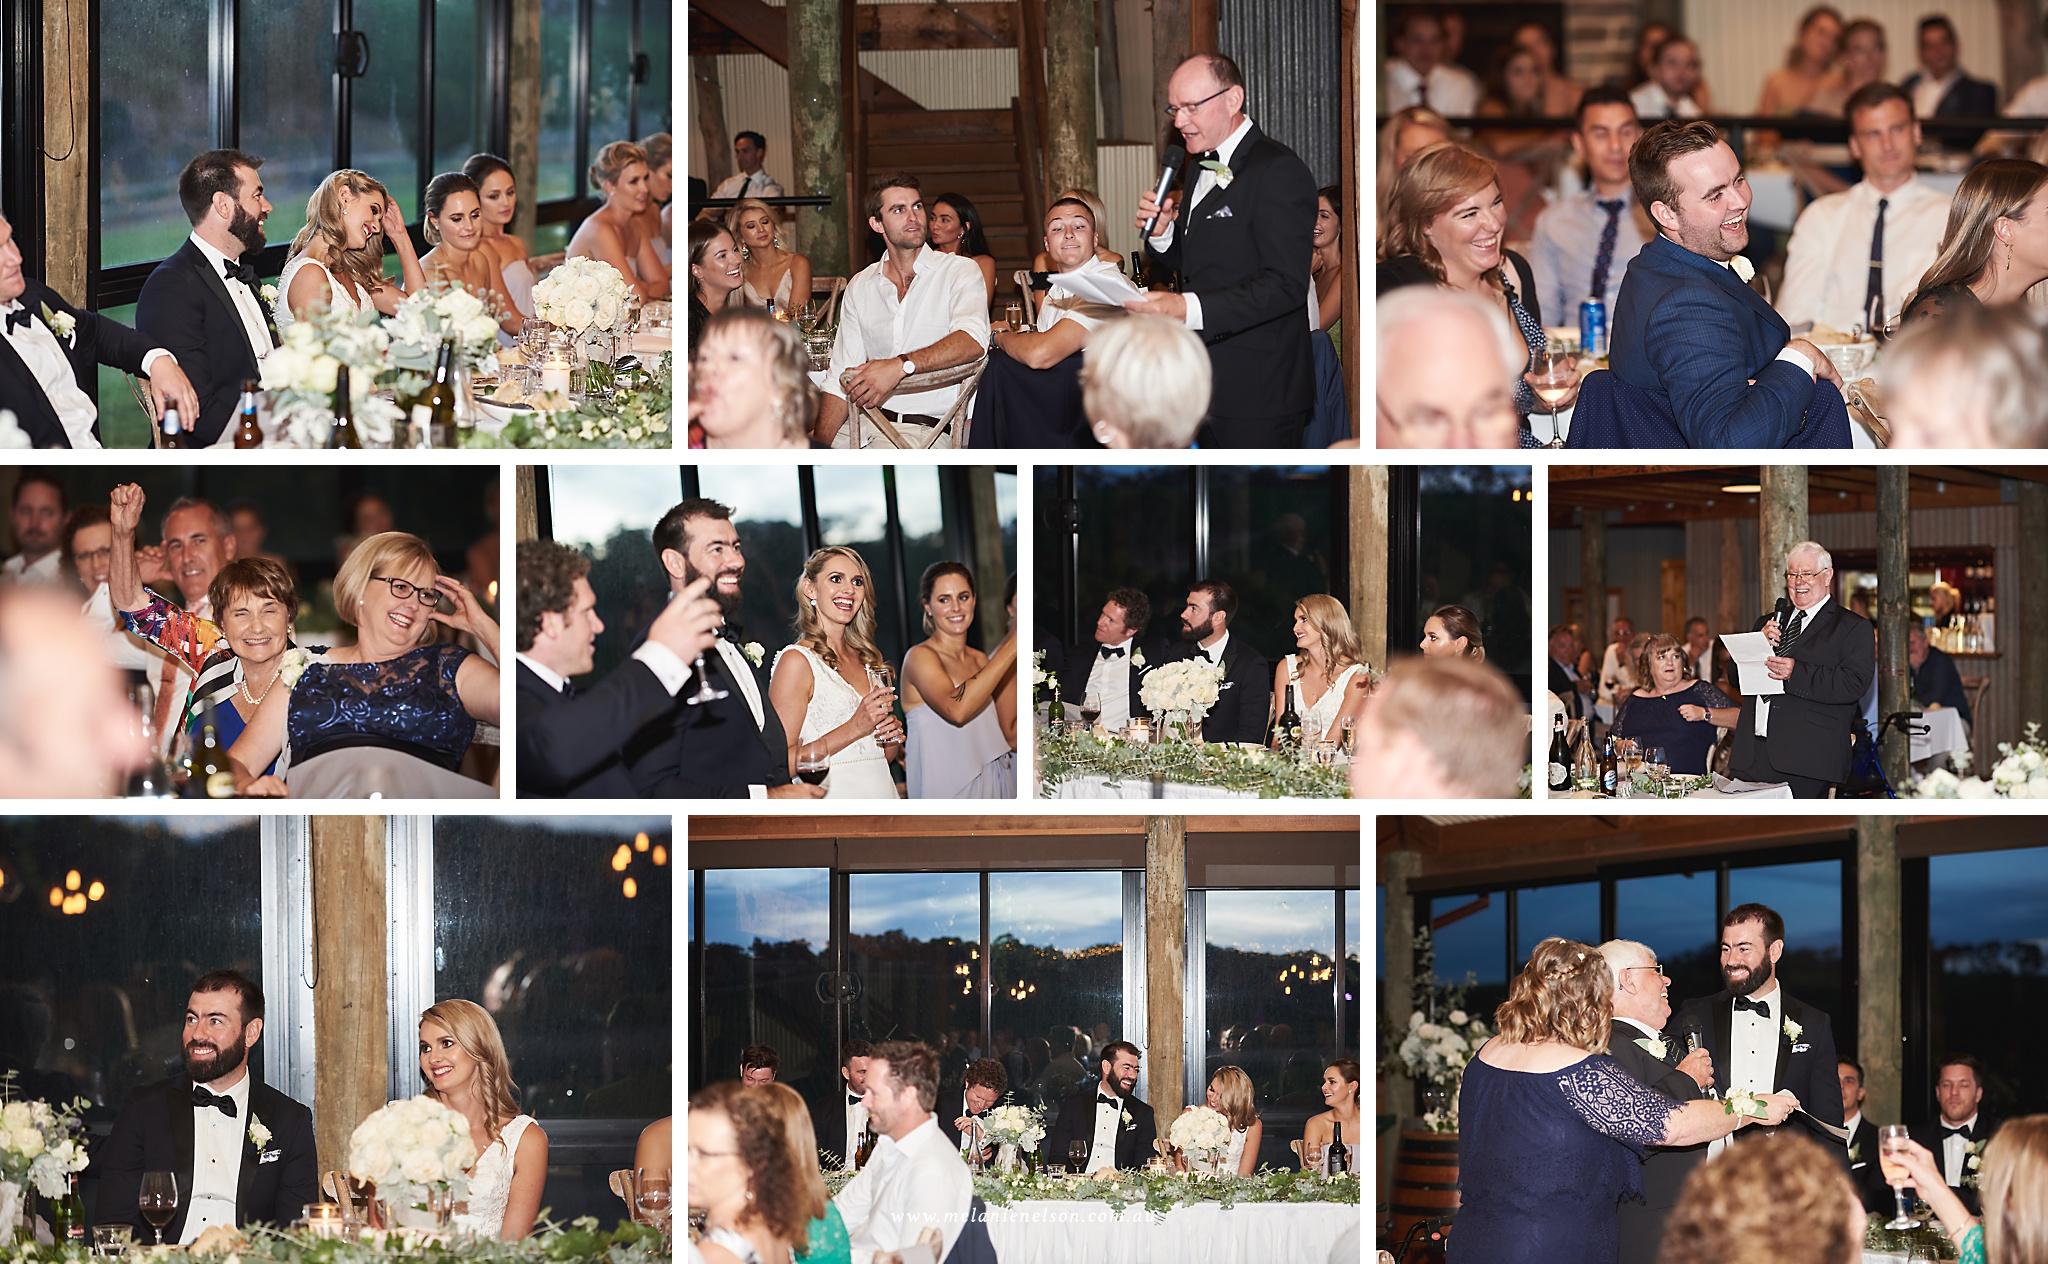 longview_vineyard_wedding_0090.jpg